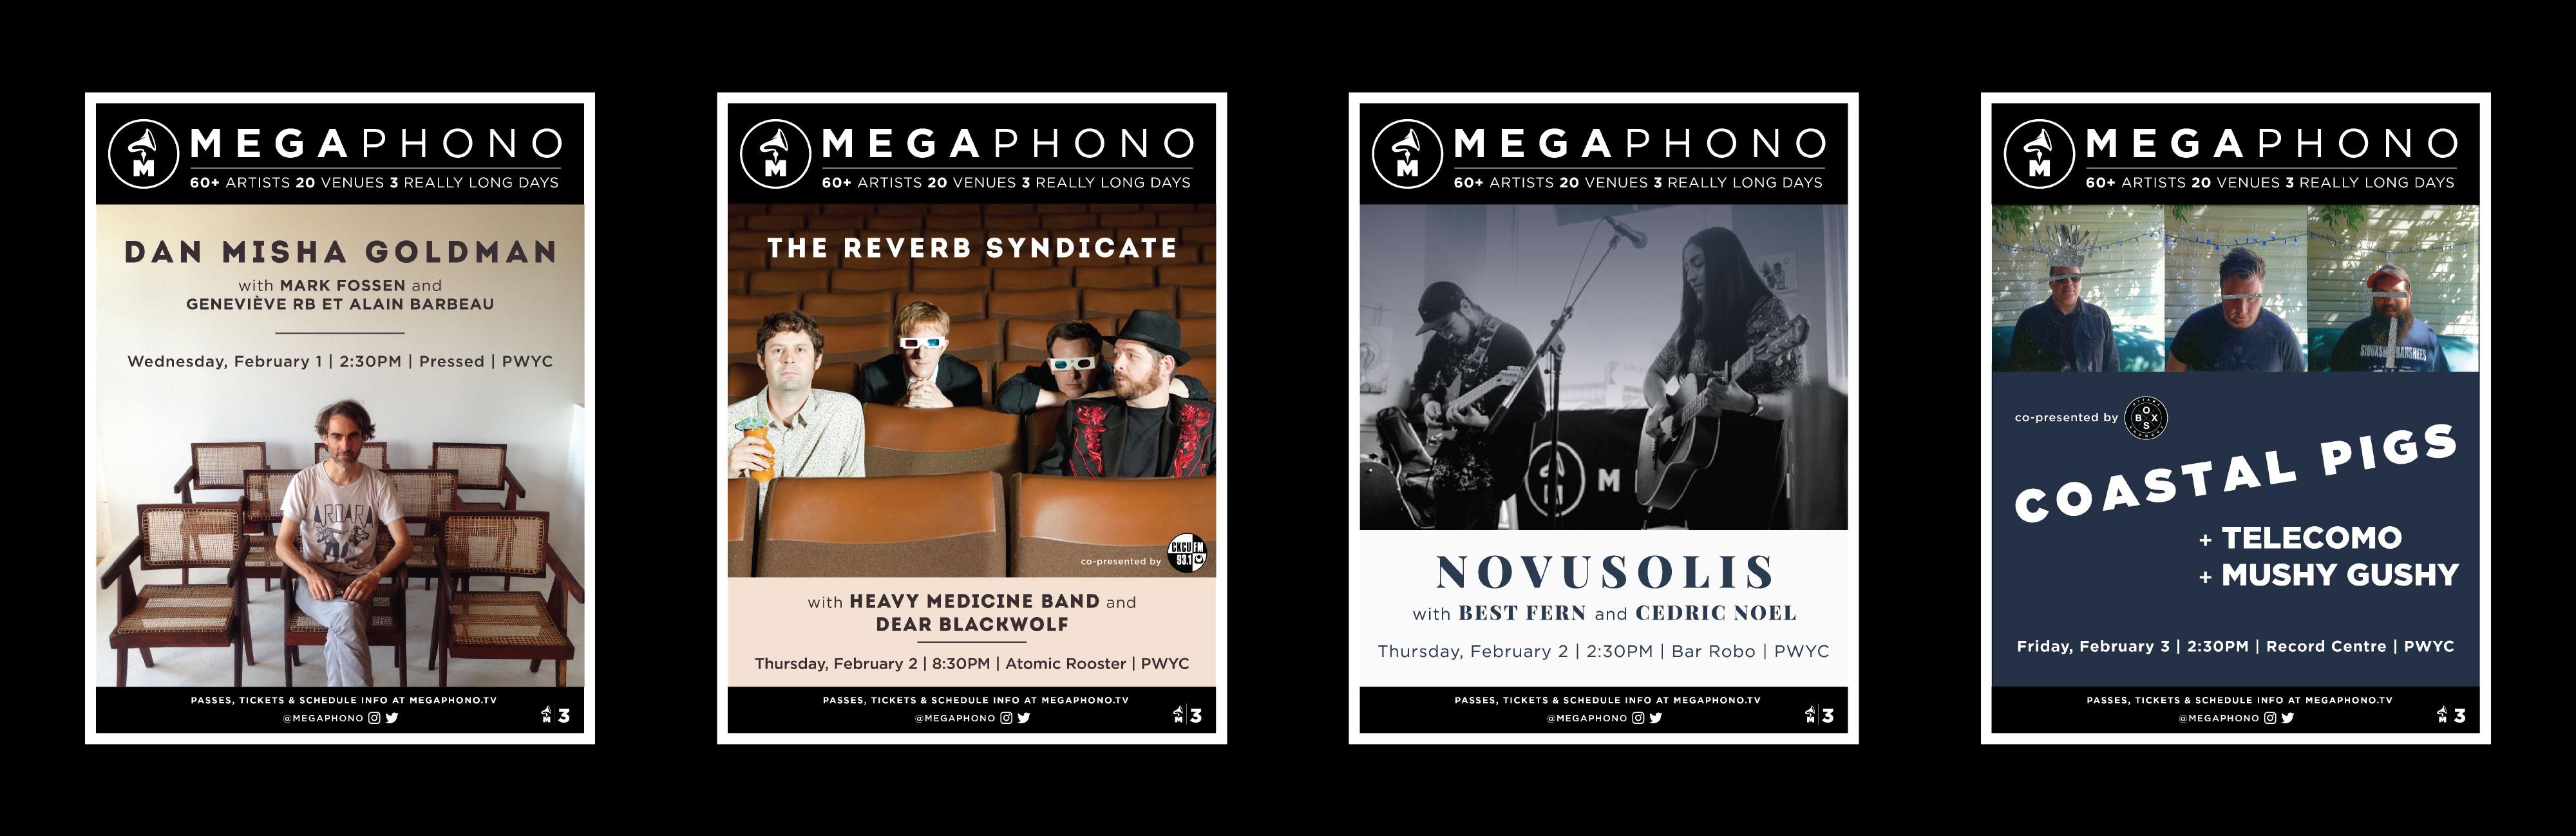 megaphono-posters-04